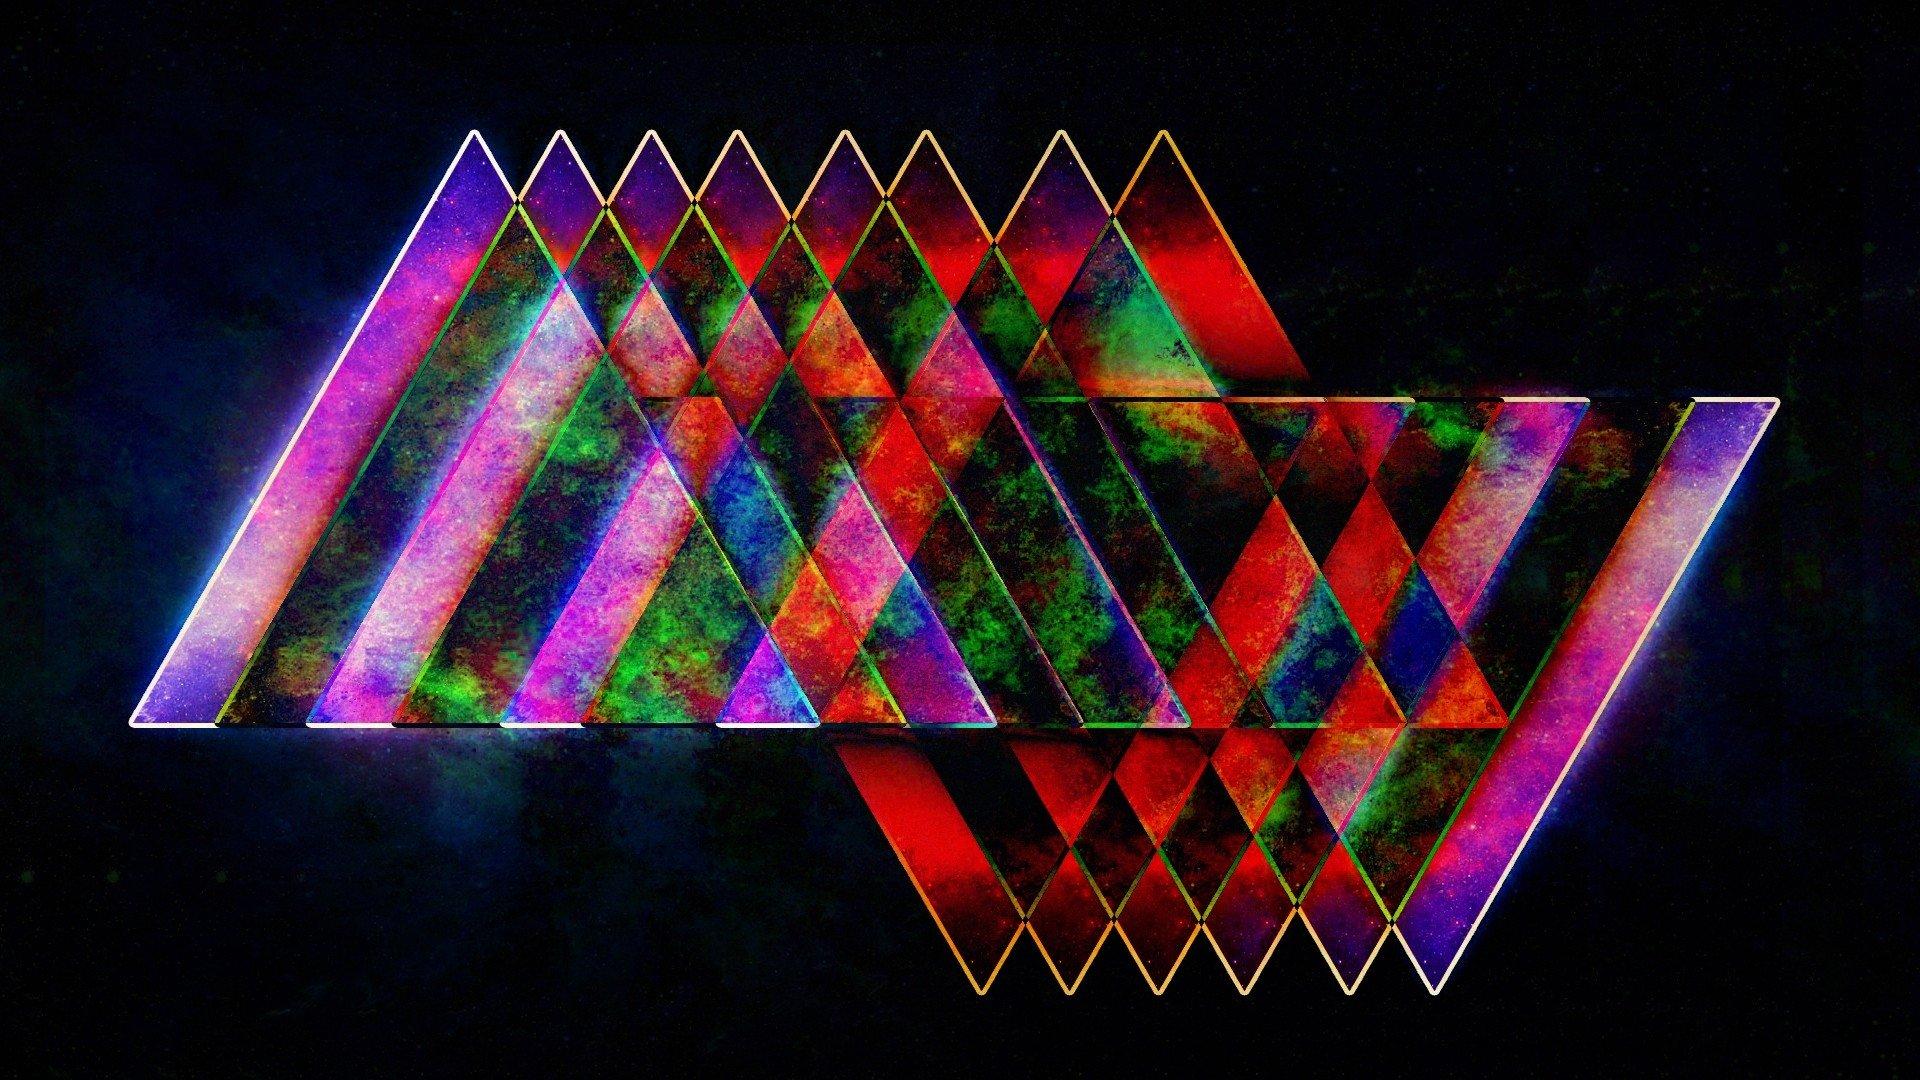 HD Abstract Wallpapers 1920x1080 - WallpaperSafari Desktop Backgrounds 1920x1080 Abstract